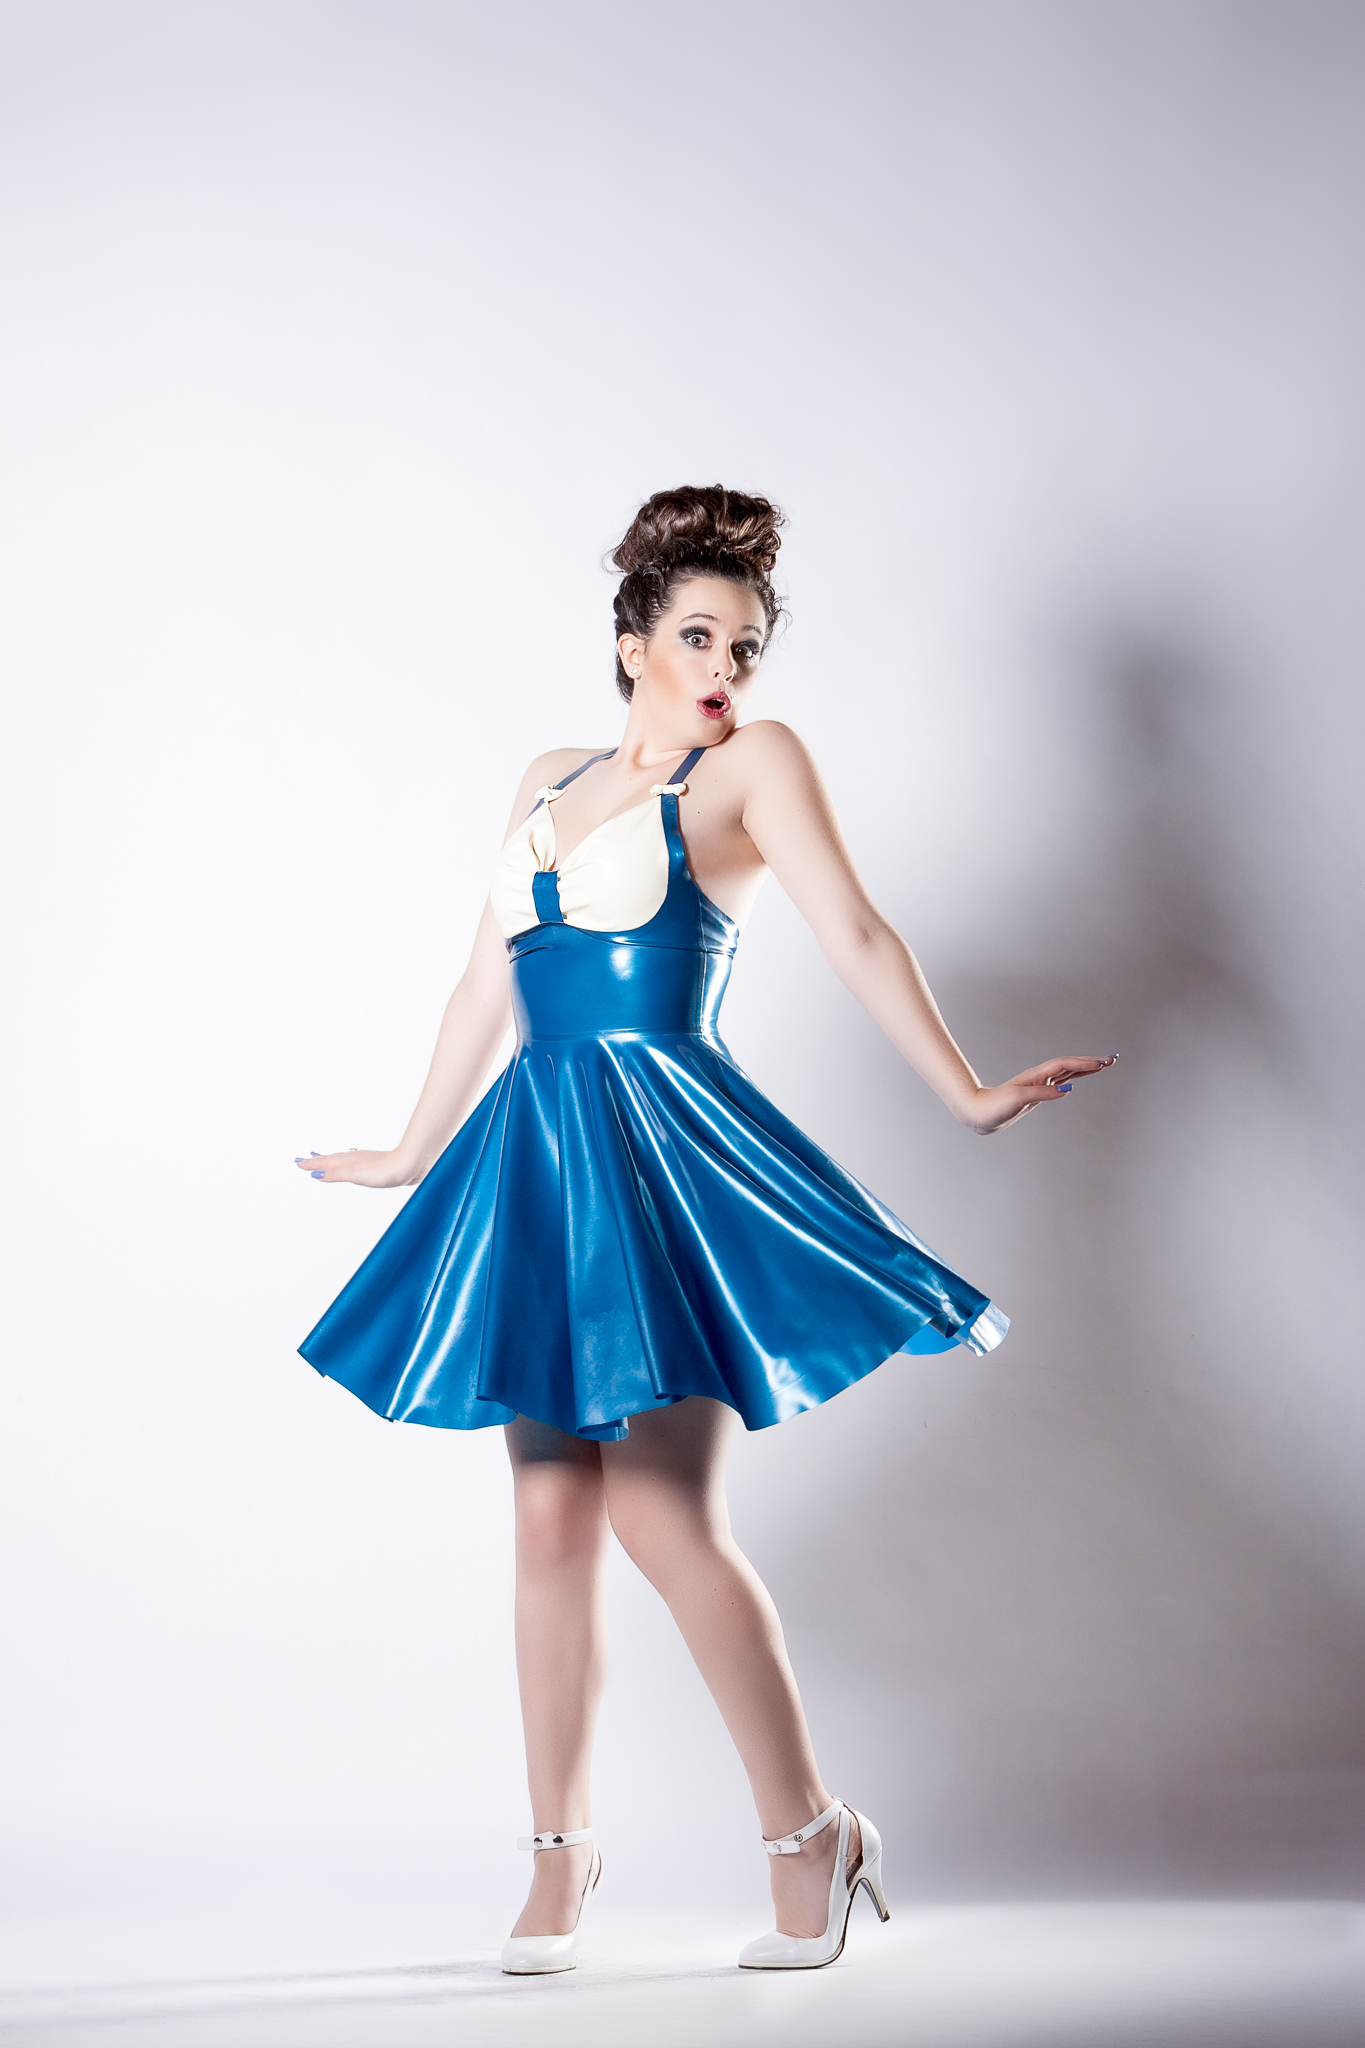 Melanie Feels Like Marilyn in this Naucler Design Latex Dress